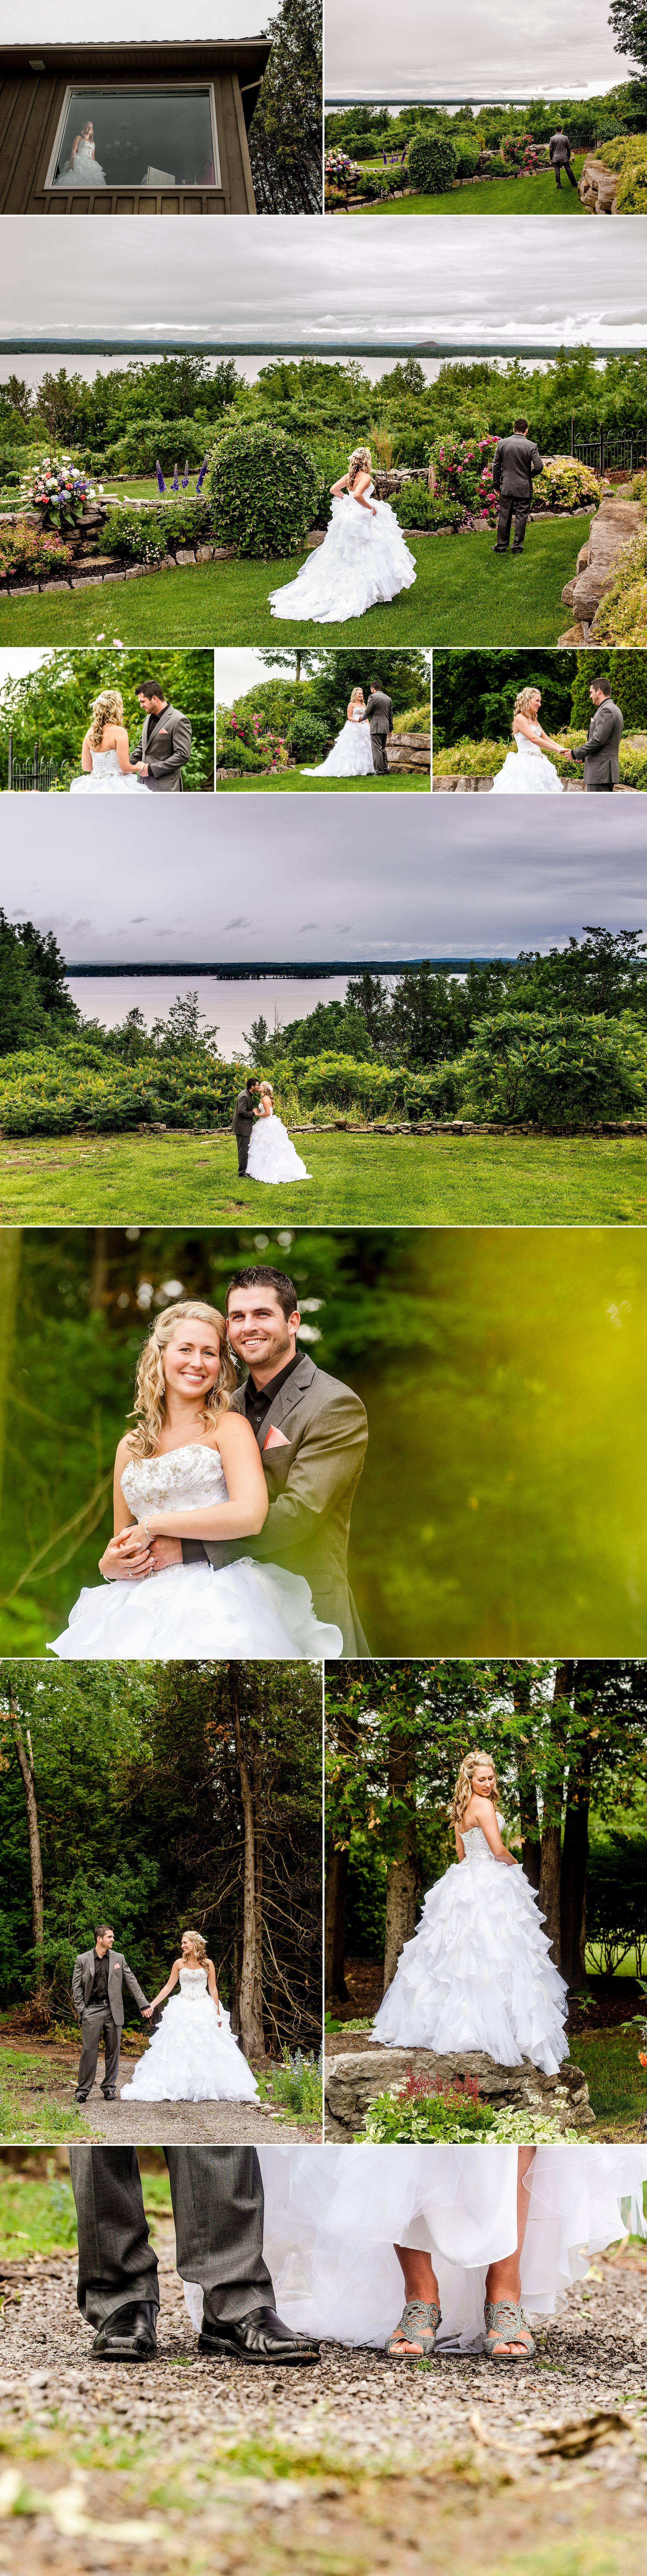 Nature wedding photographs